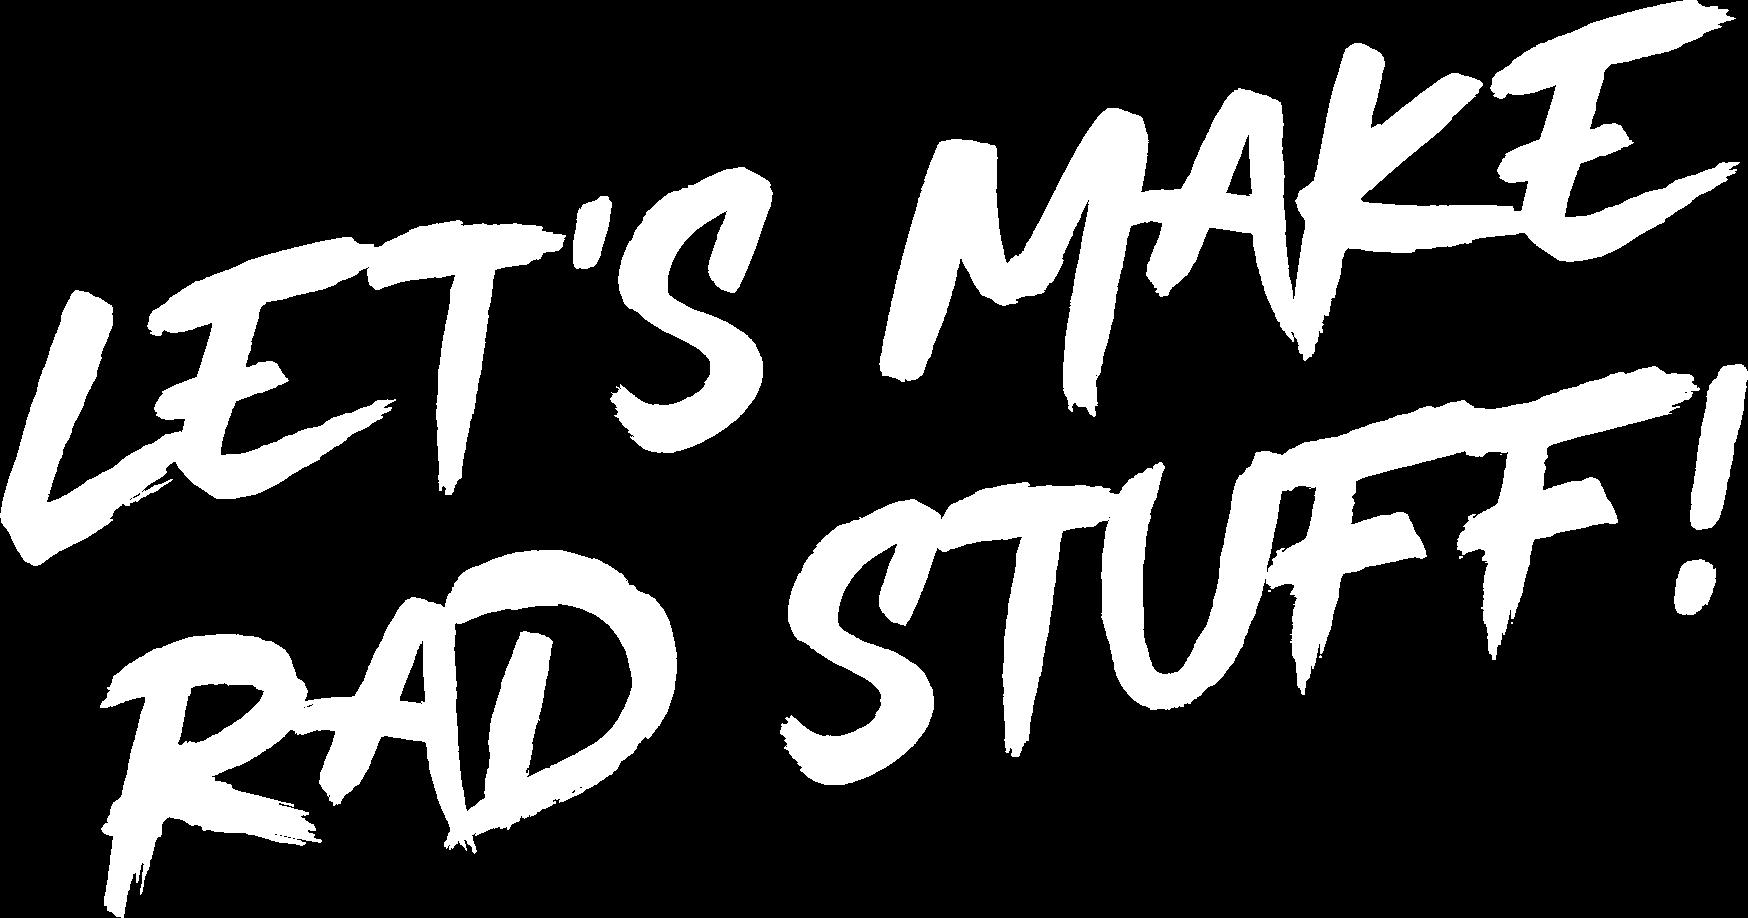 Let's Make Rad Stuff graphic